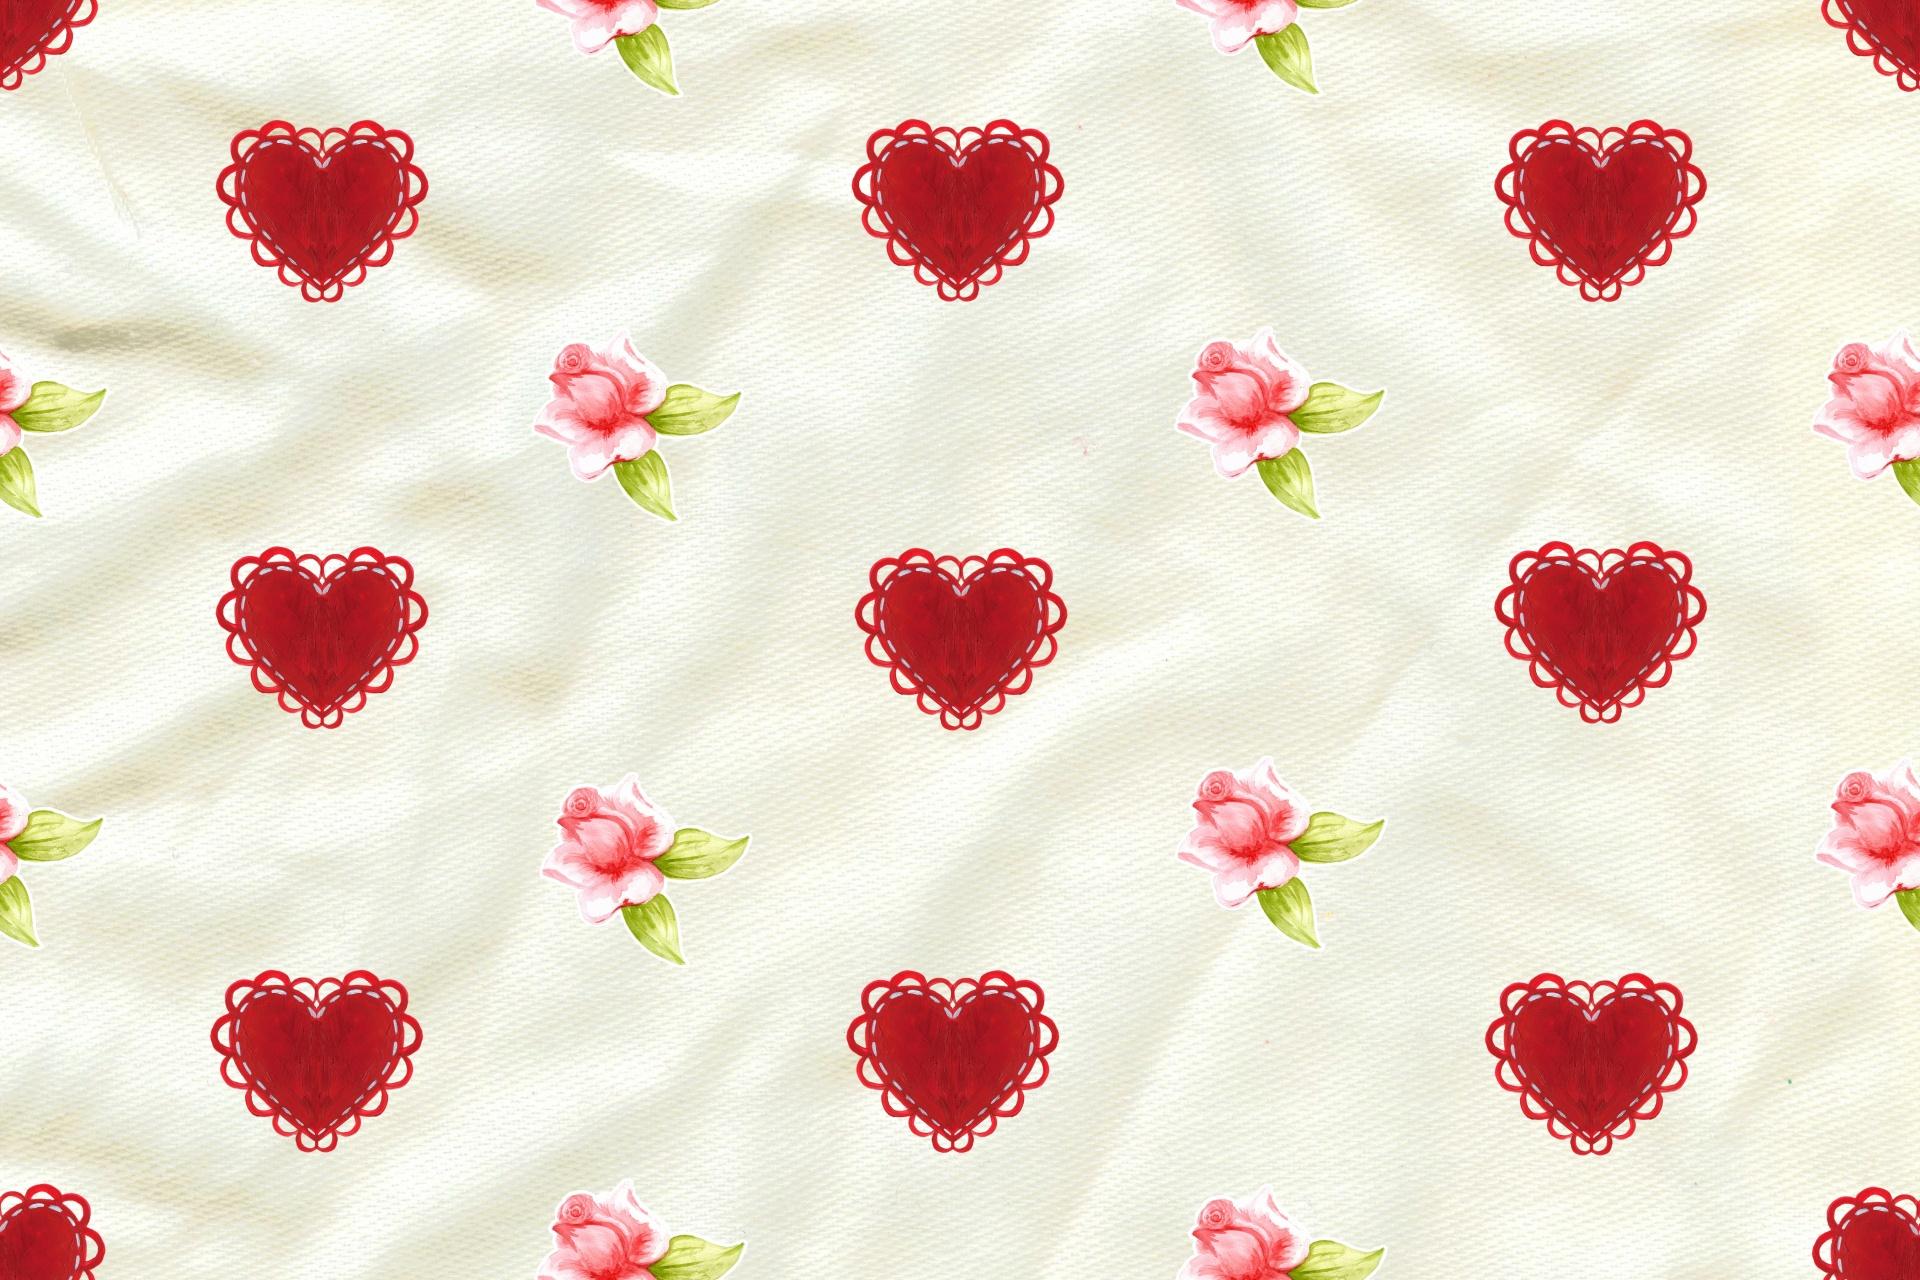 Hearts,rose,roses,valentine,love - free photo from needpix.com